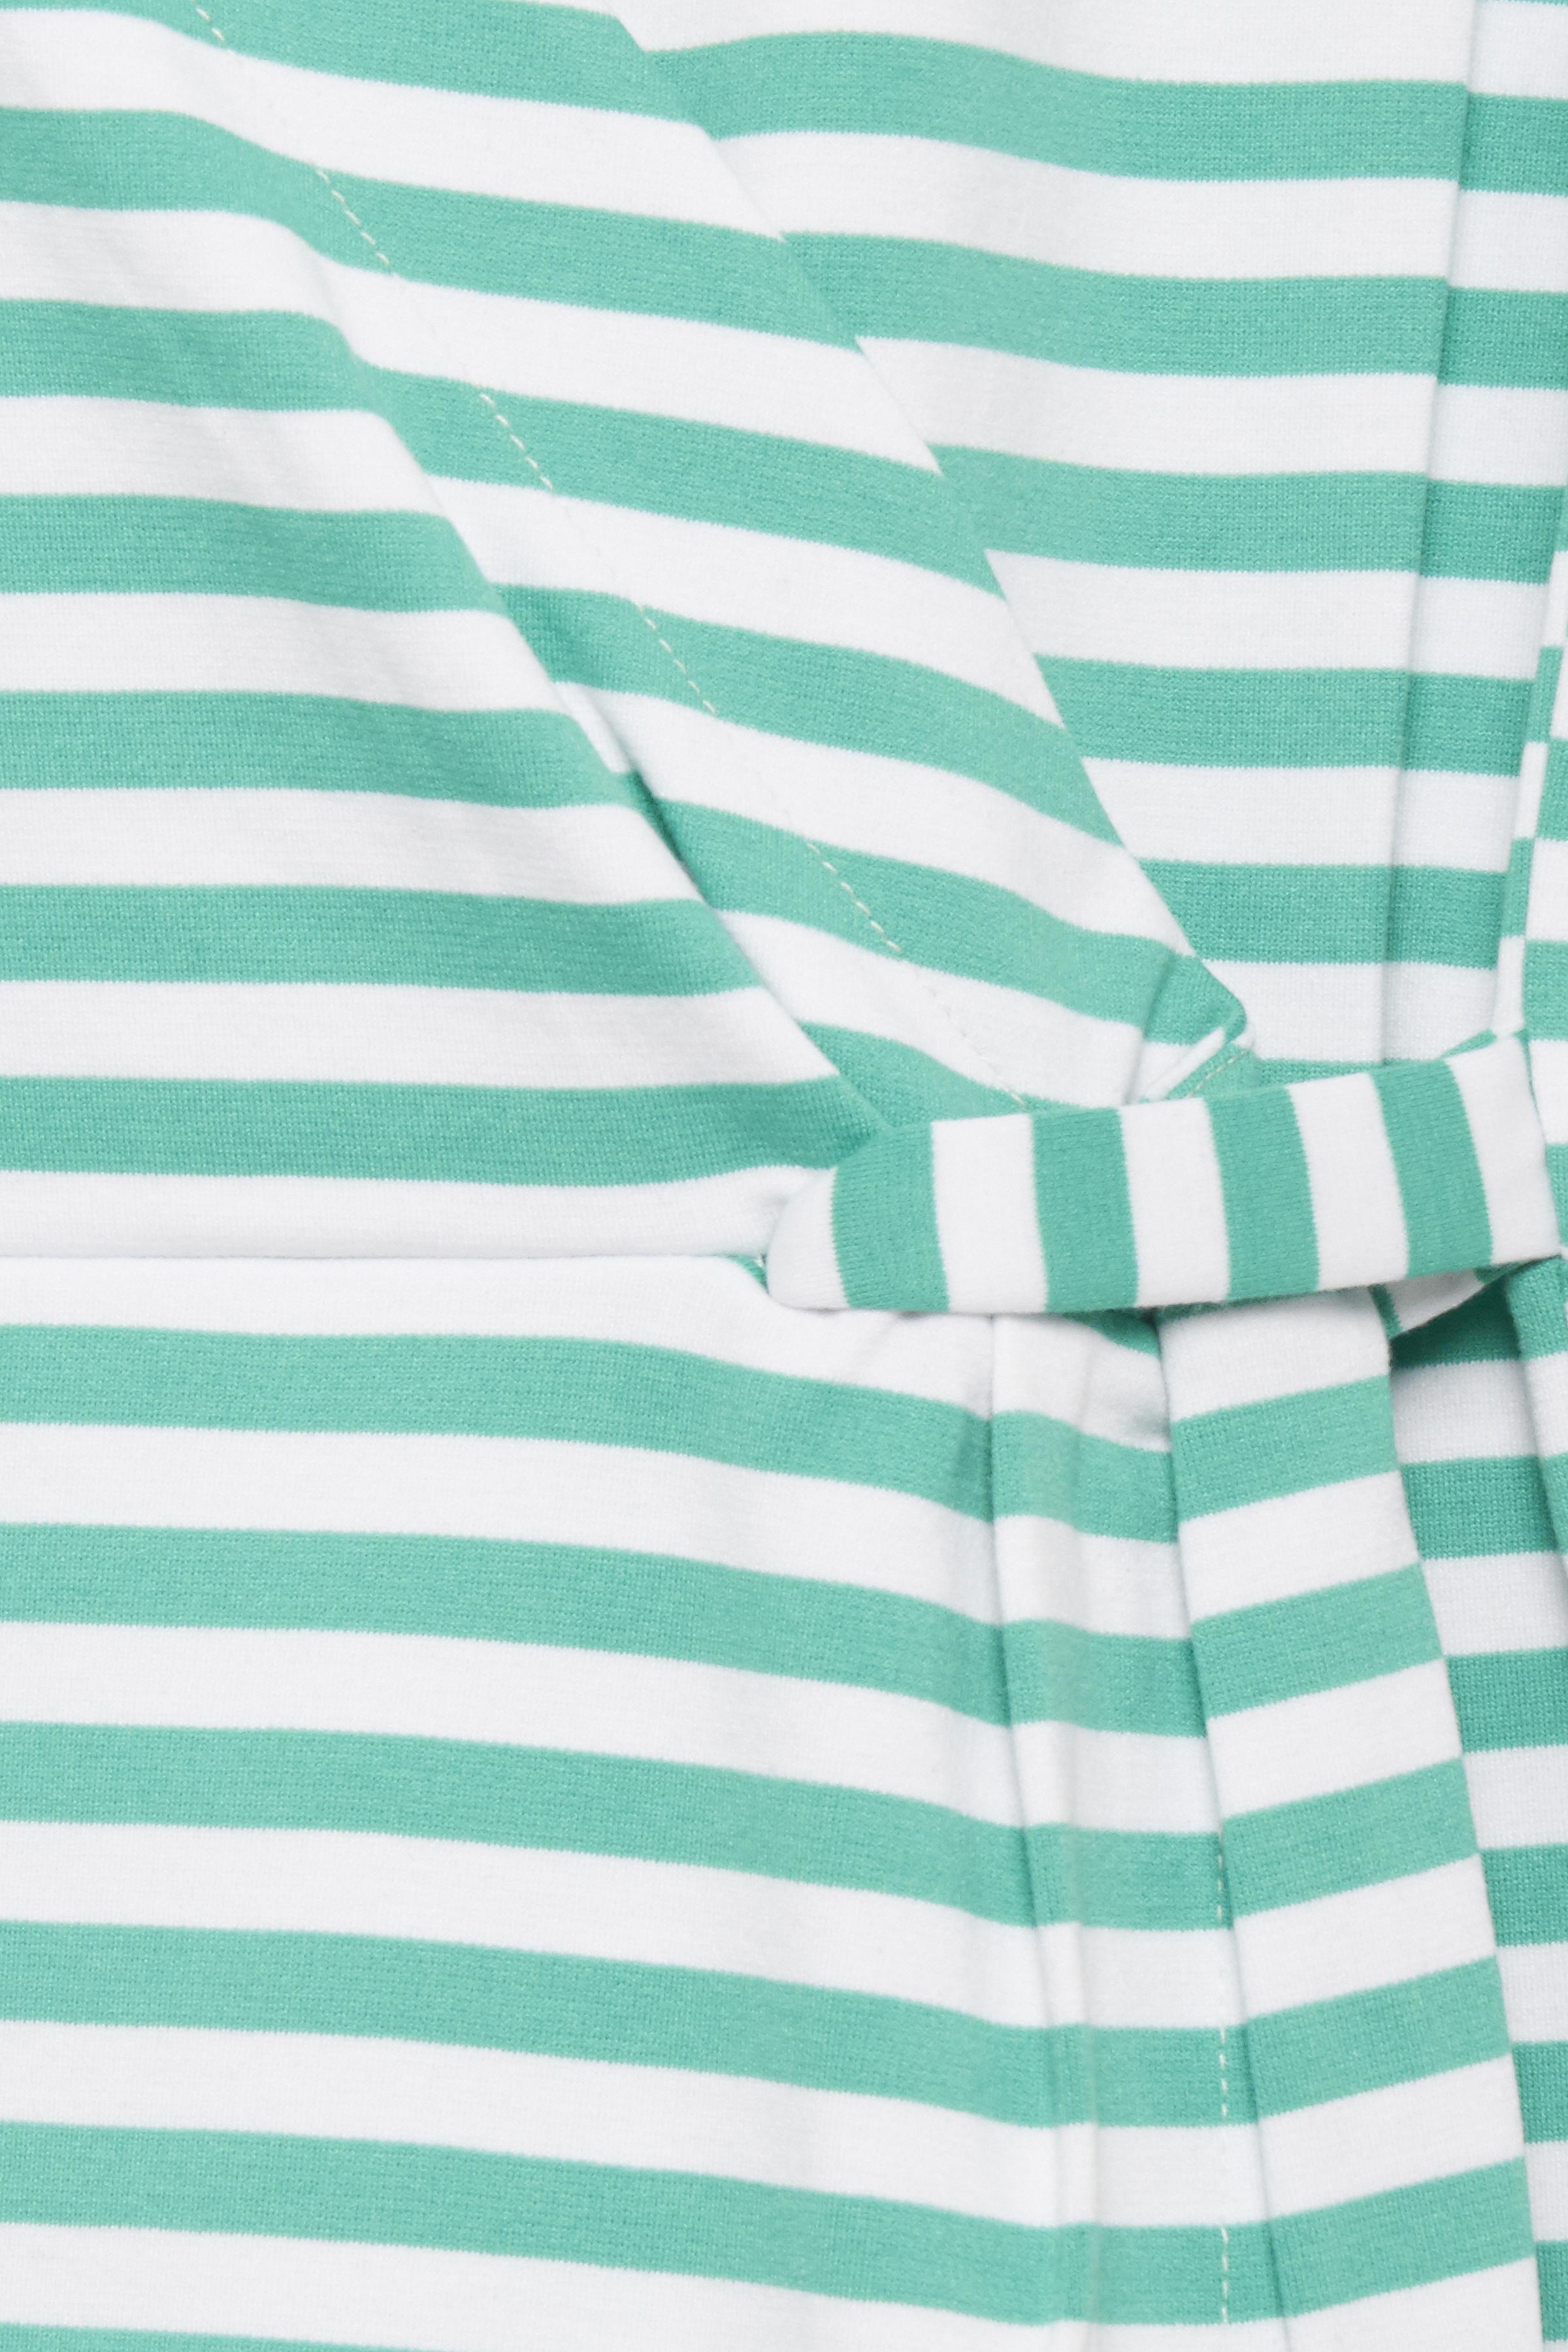 Fresh Green Big Stripe Klänning från b.young – Köp Fresh Green Big Stripe Klänning från storlek S-XXL här